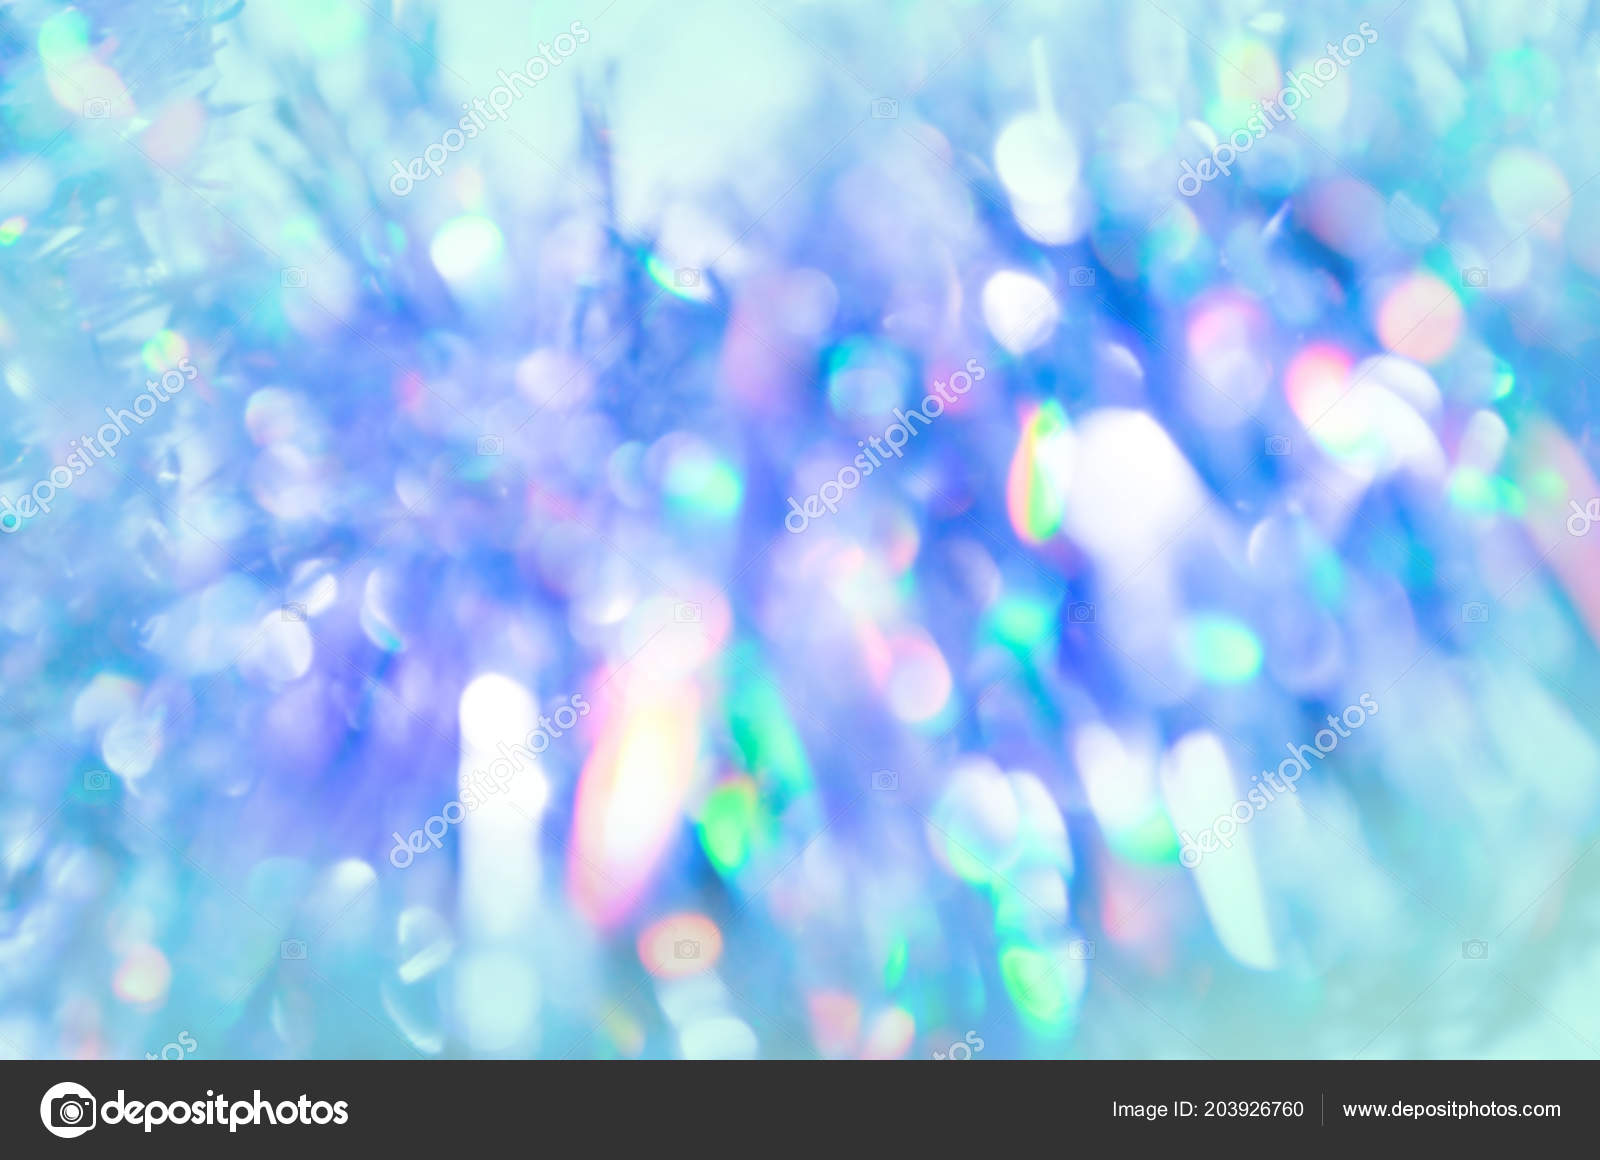 Unduh 40+ Background Blue Bubble Gratis Terbaru